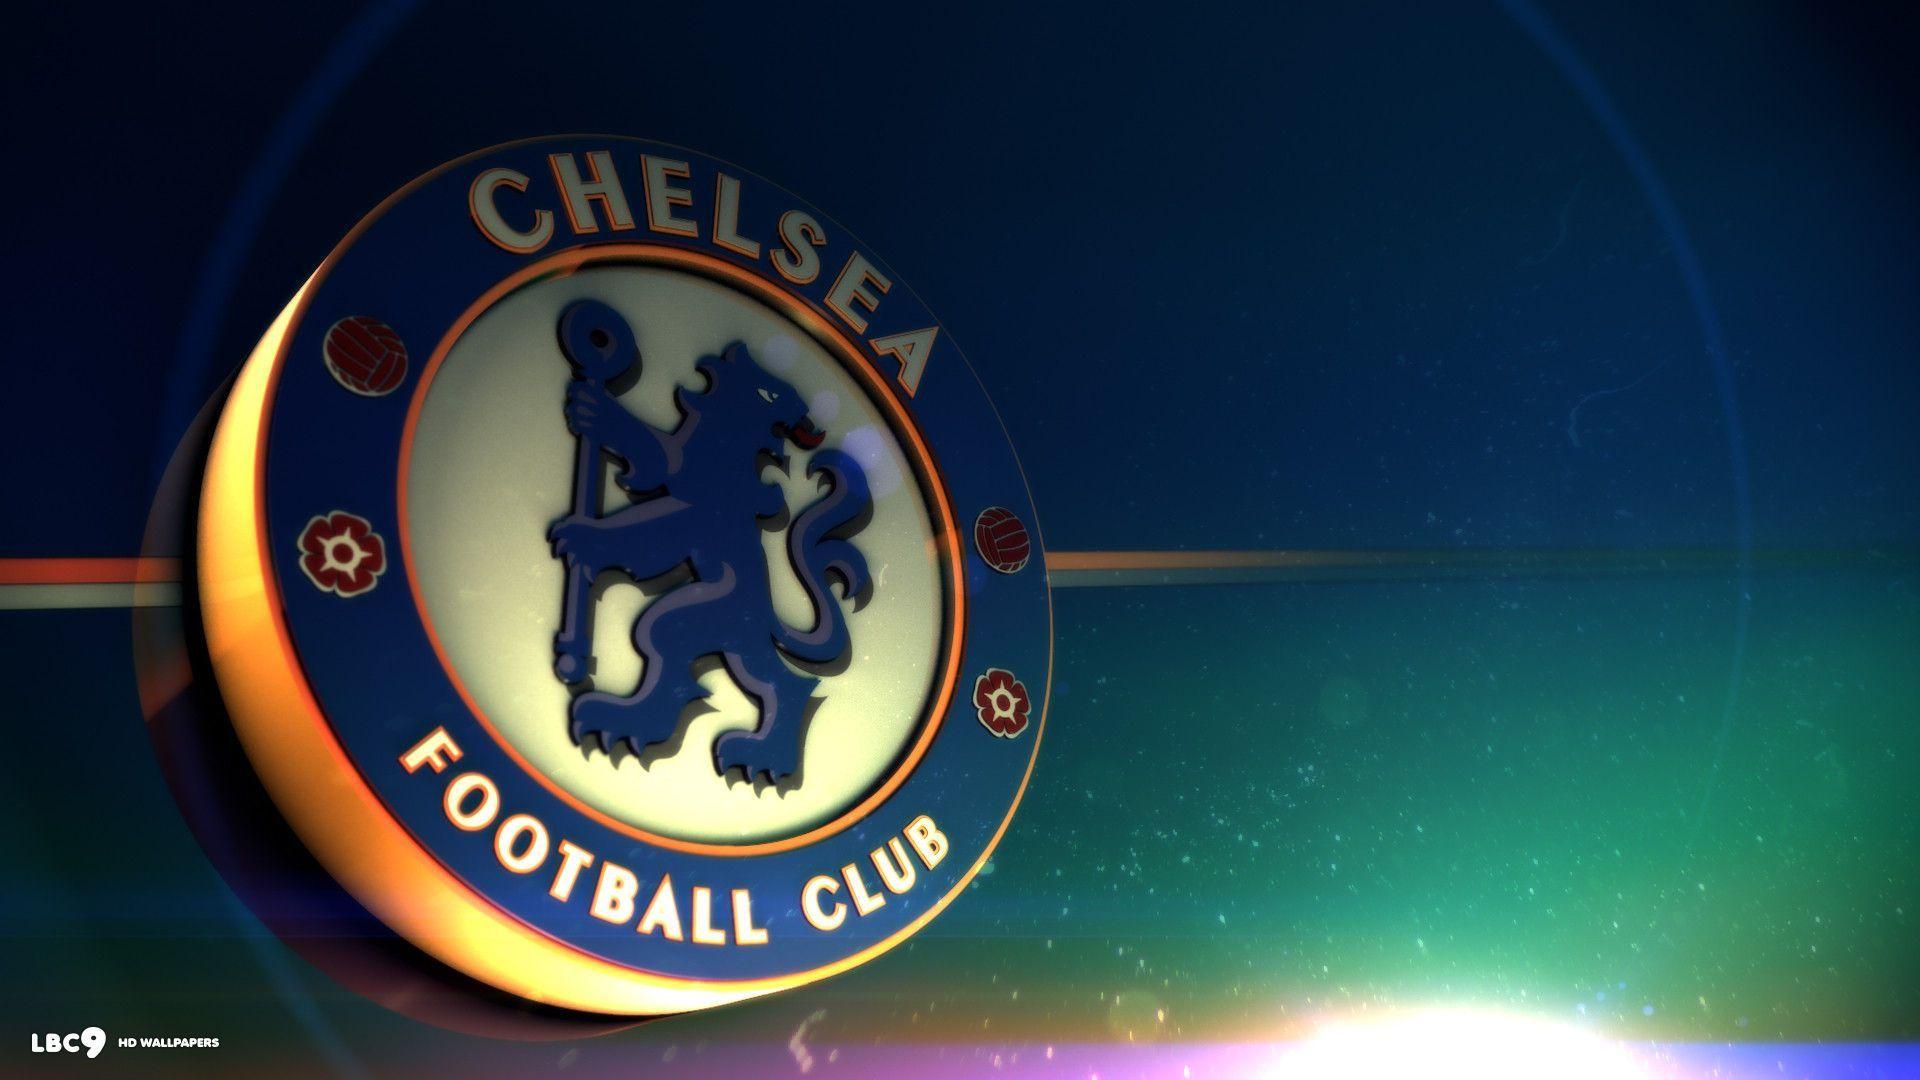 Chelsea wallpaper theme